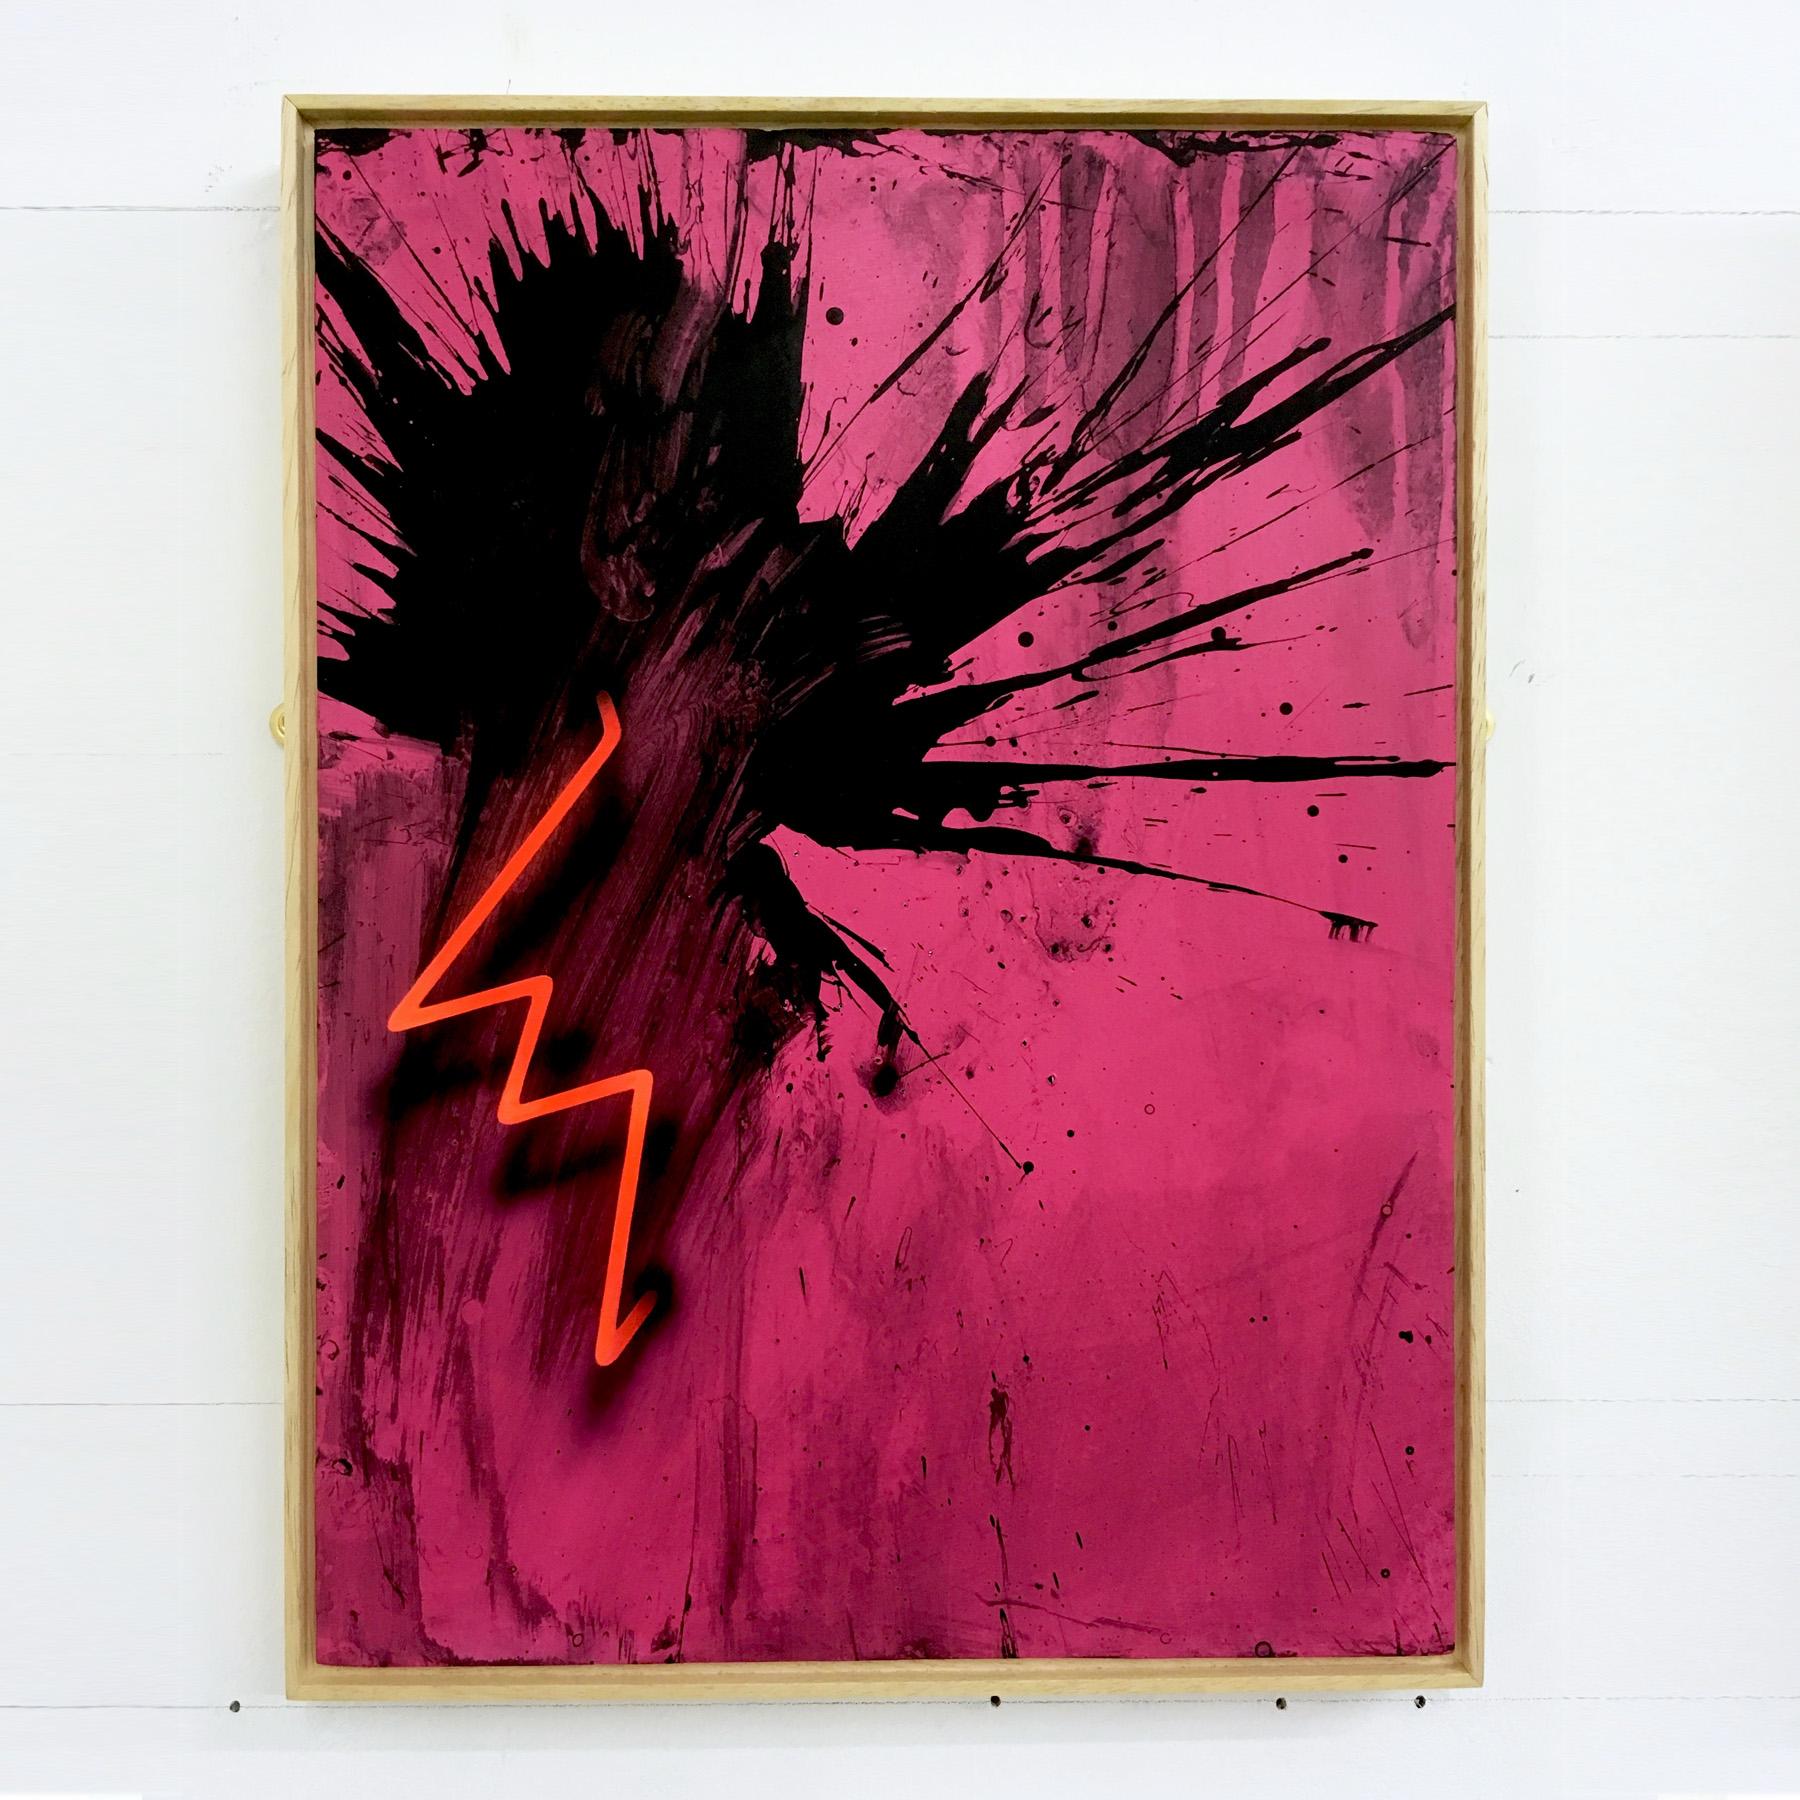 005 - Mike Edwards - Black Firework Painting 190919 (40x30cm).jpg